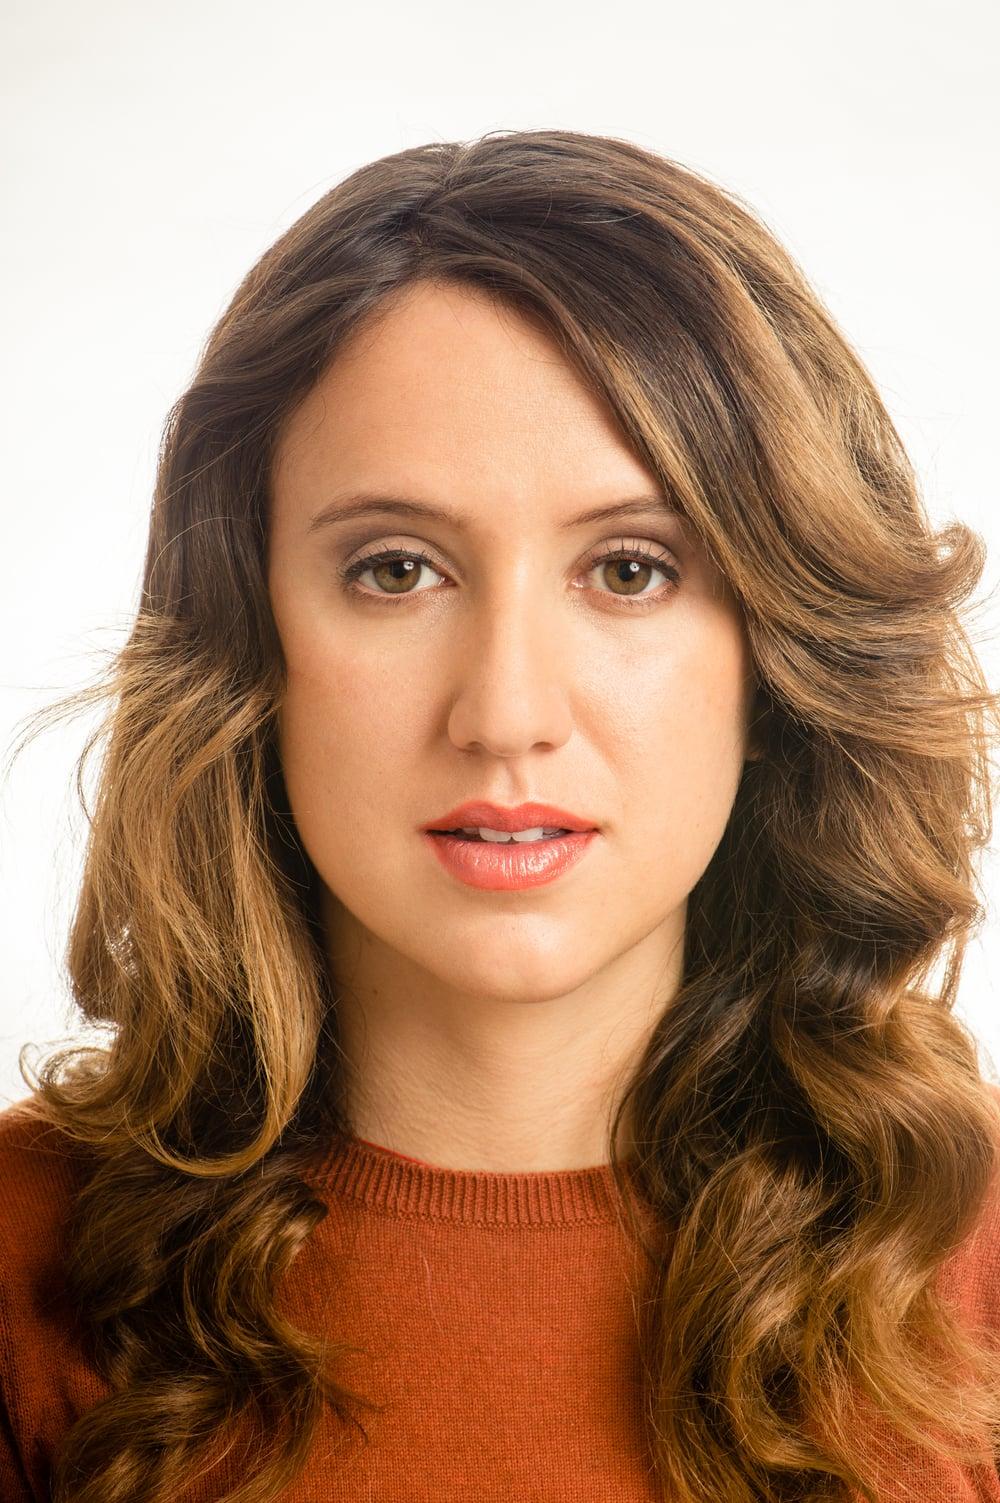 Adalia Tara, Musician/Singer/Songwriter in Sedona AZ & Los Angeles CA www.adaliatara.com